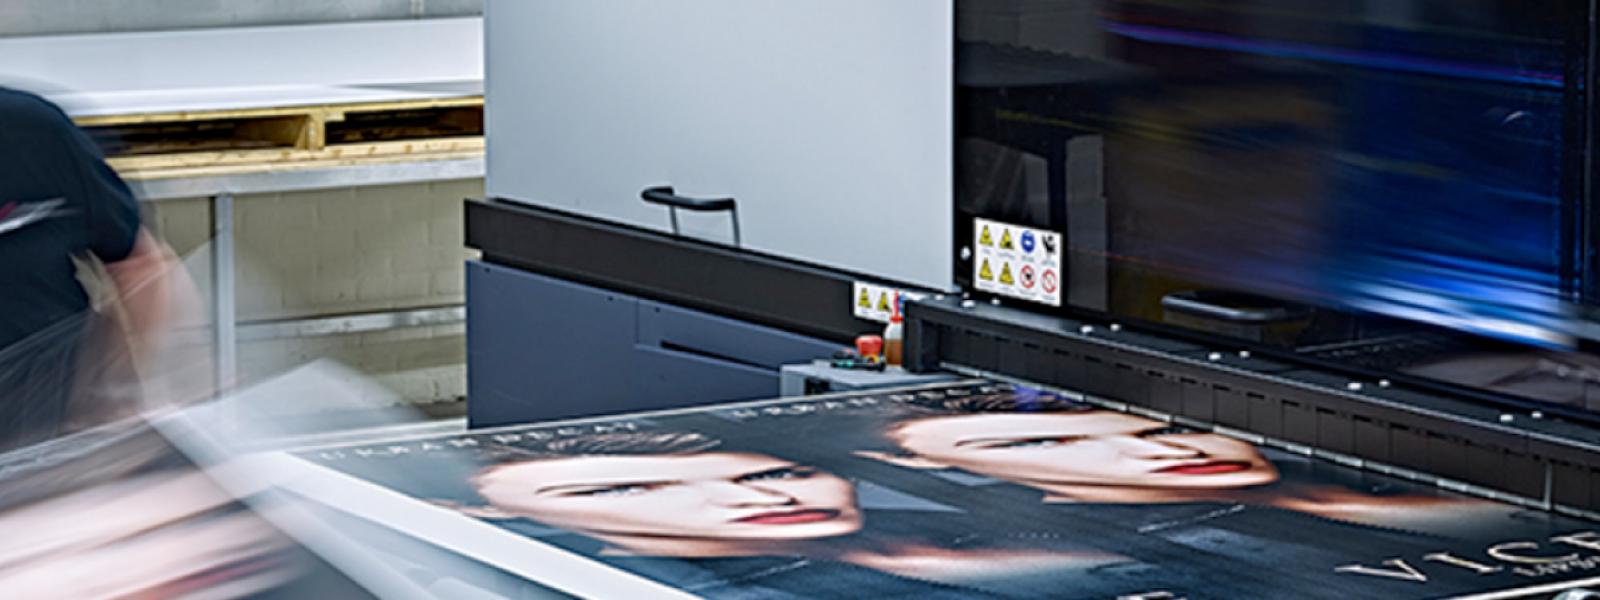 SG_factory_printer